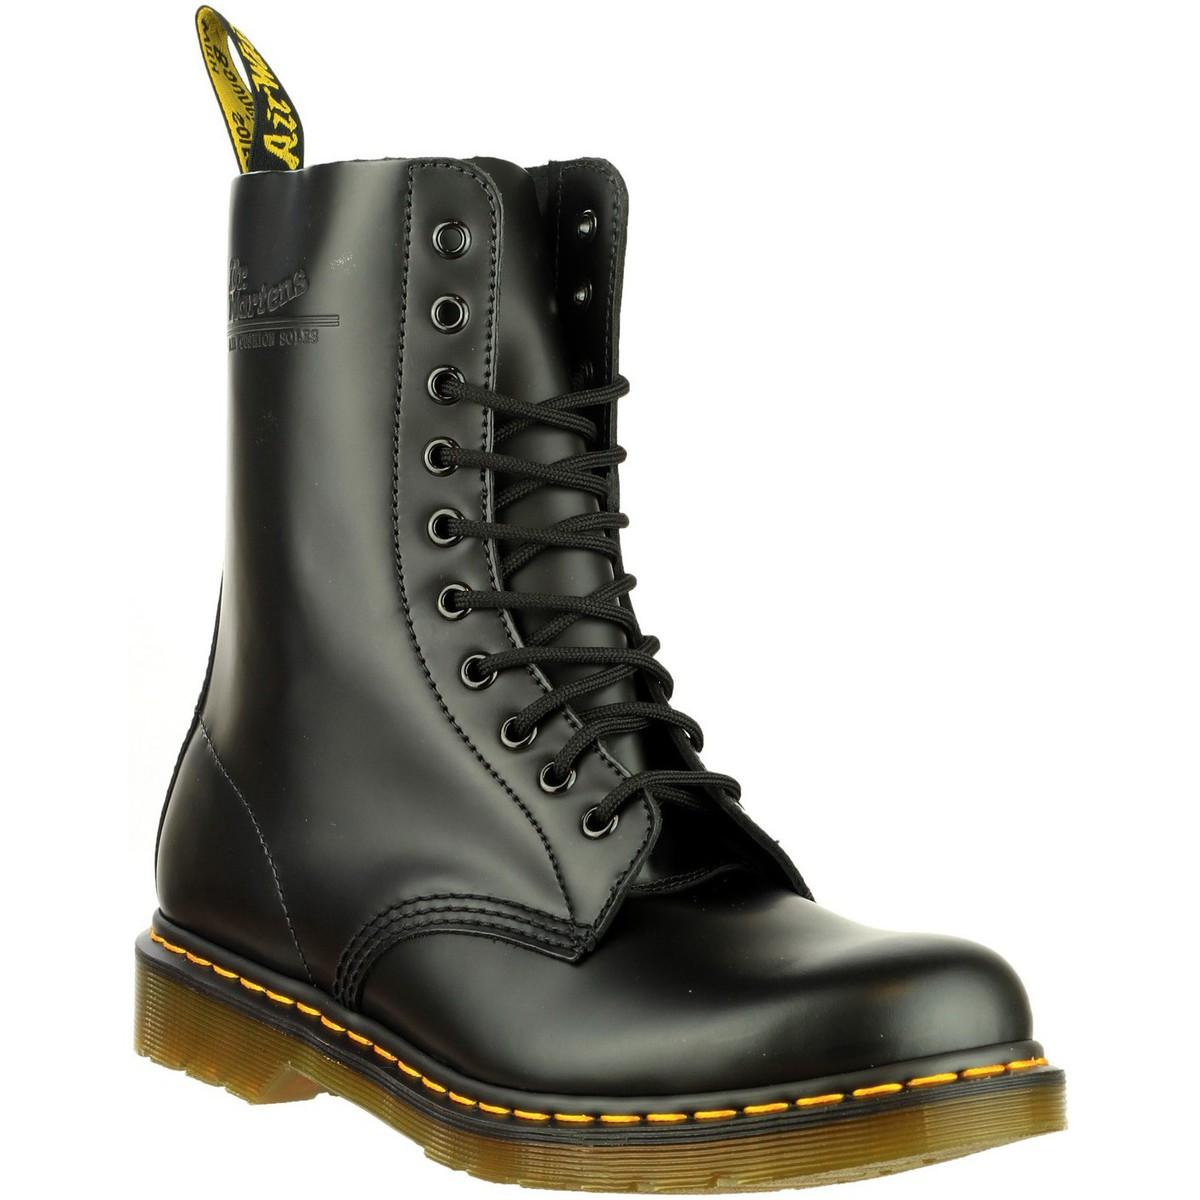 Doc Marten 1460 | Dr Martens Womens Boots | Doc Marten Boots Mens